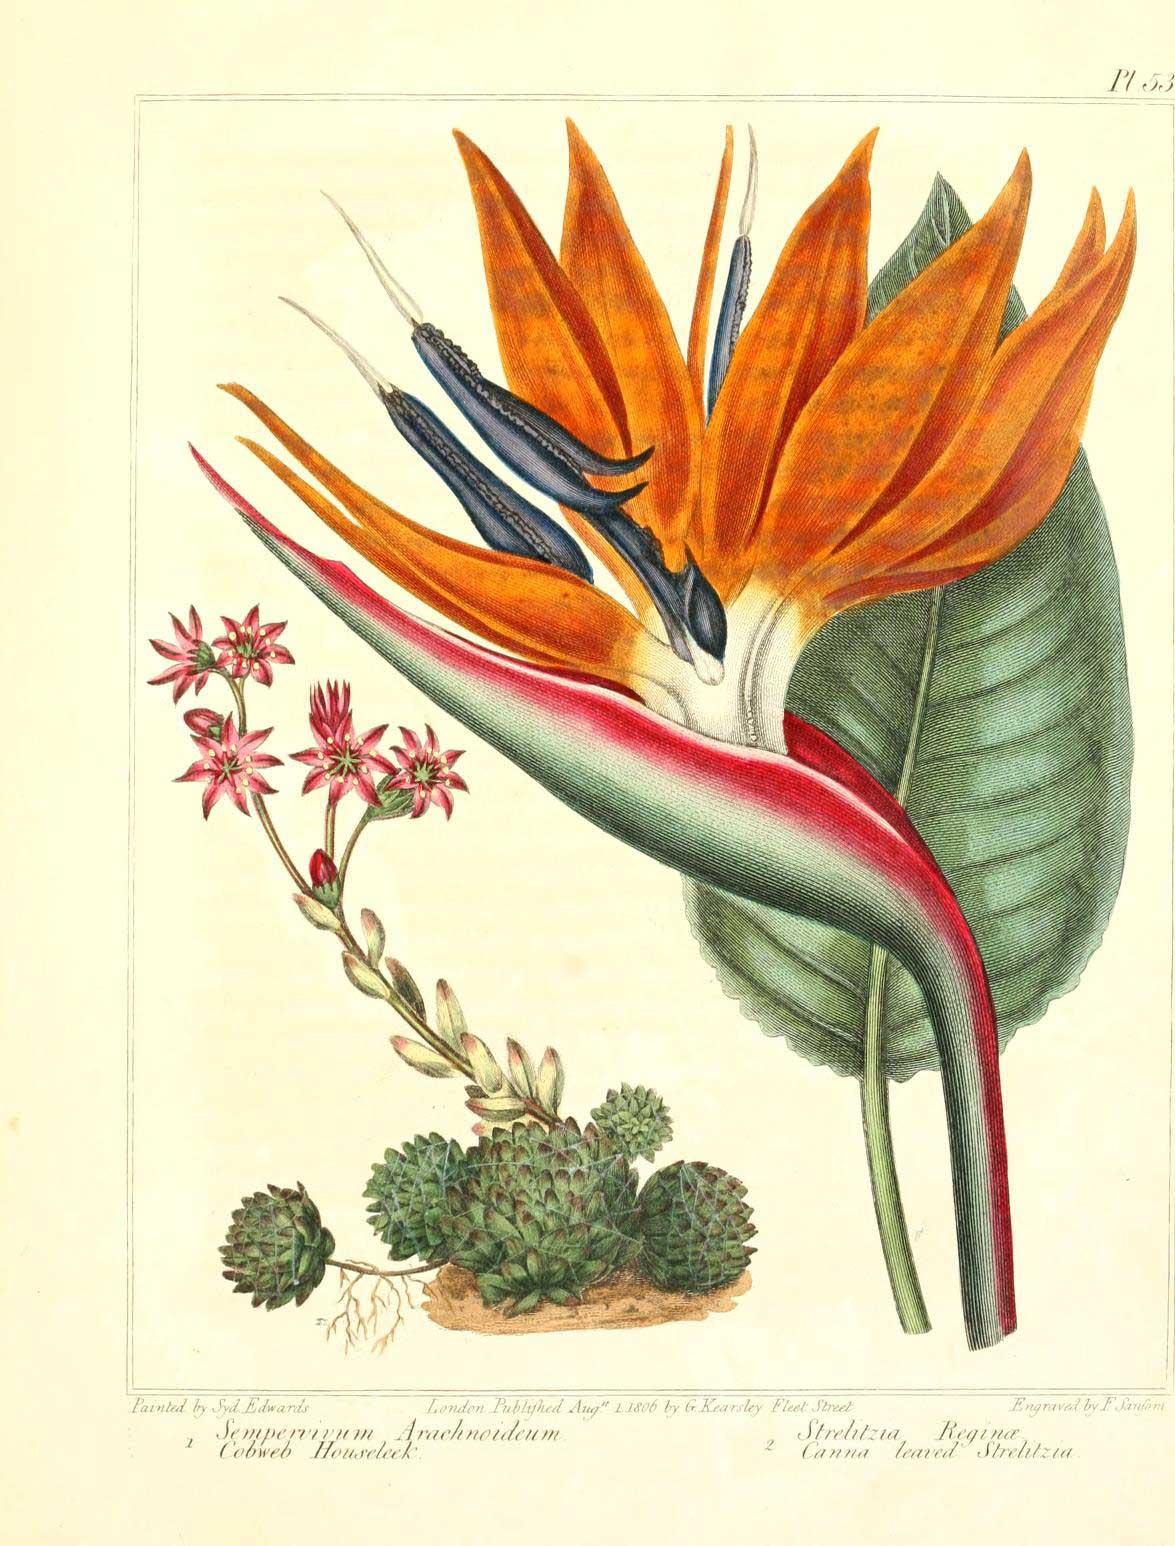 Sempervivum arachnoideum (Sempervivum arachnoideum L.).